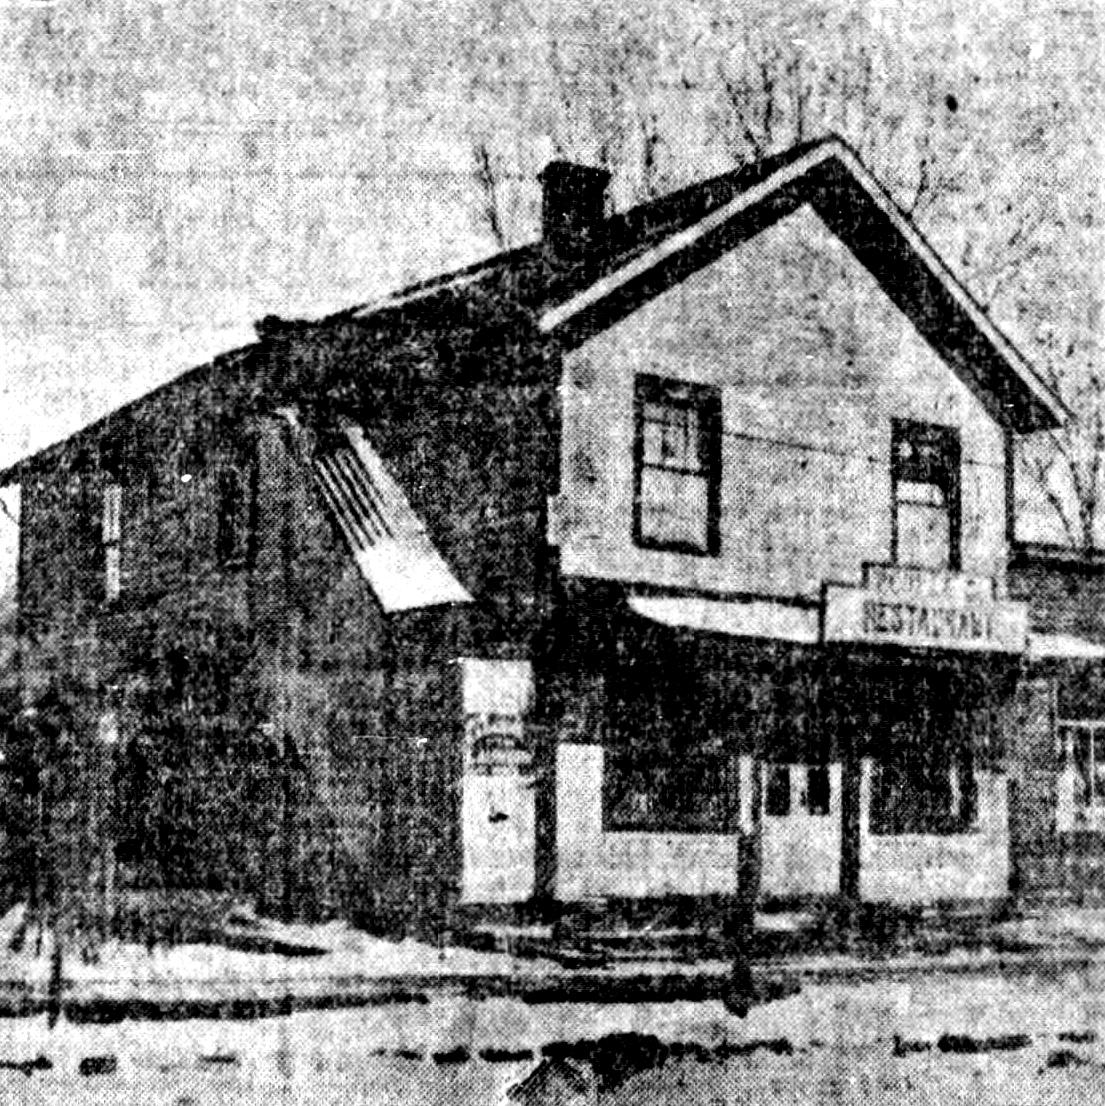 Thomas Oliver's house in Epworth, Iowa